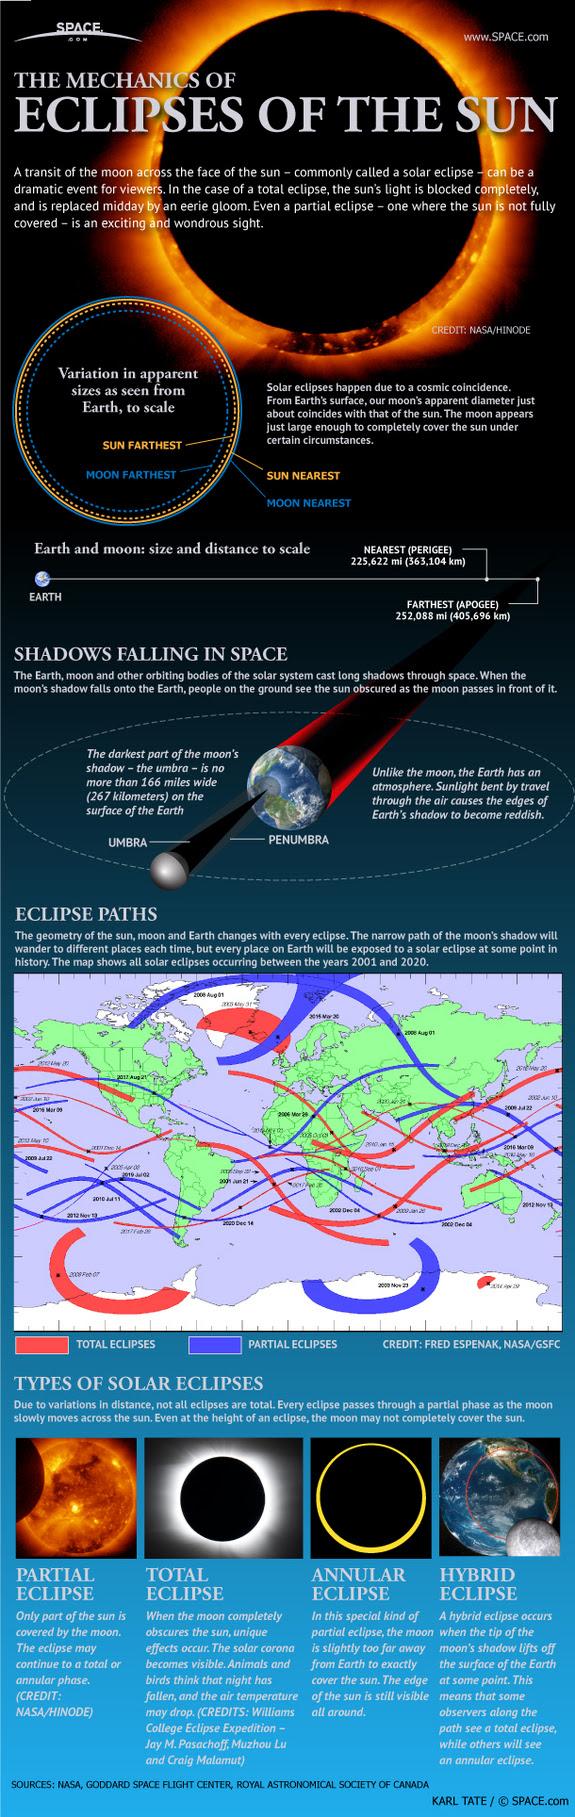 ECLIPSE SOLAR TOTAL 13 DE NOVIEMBRE 2012